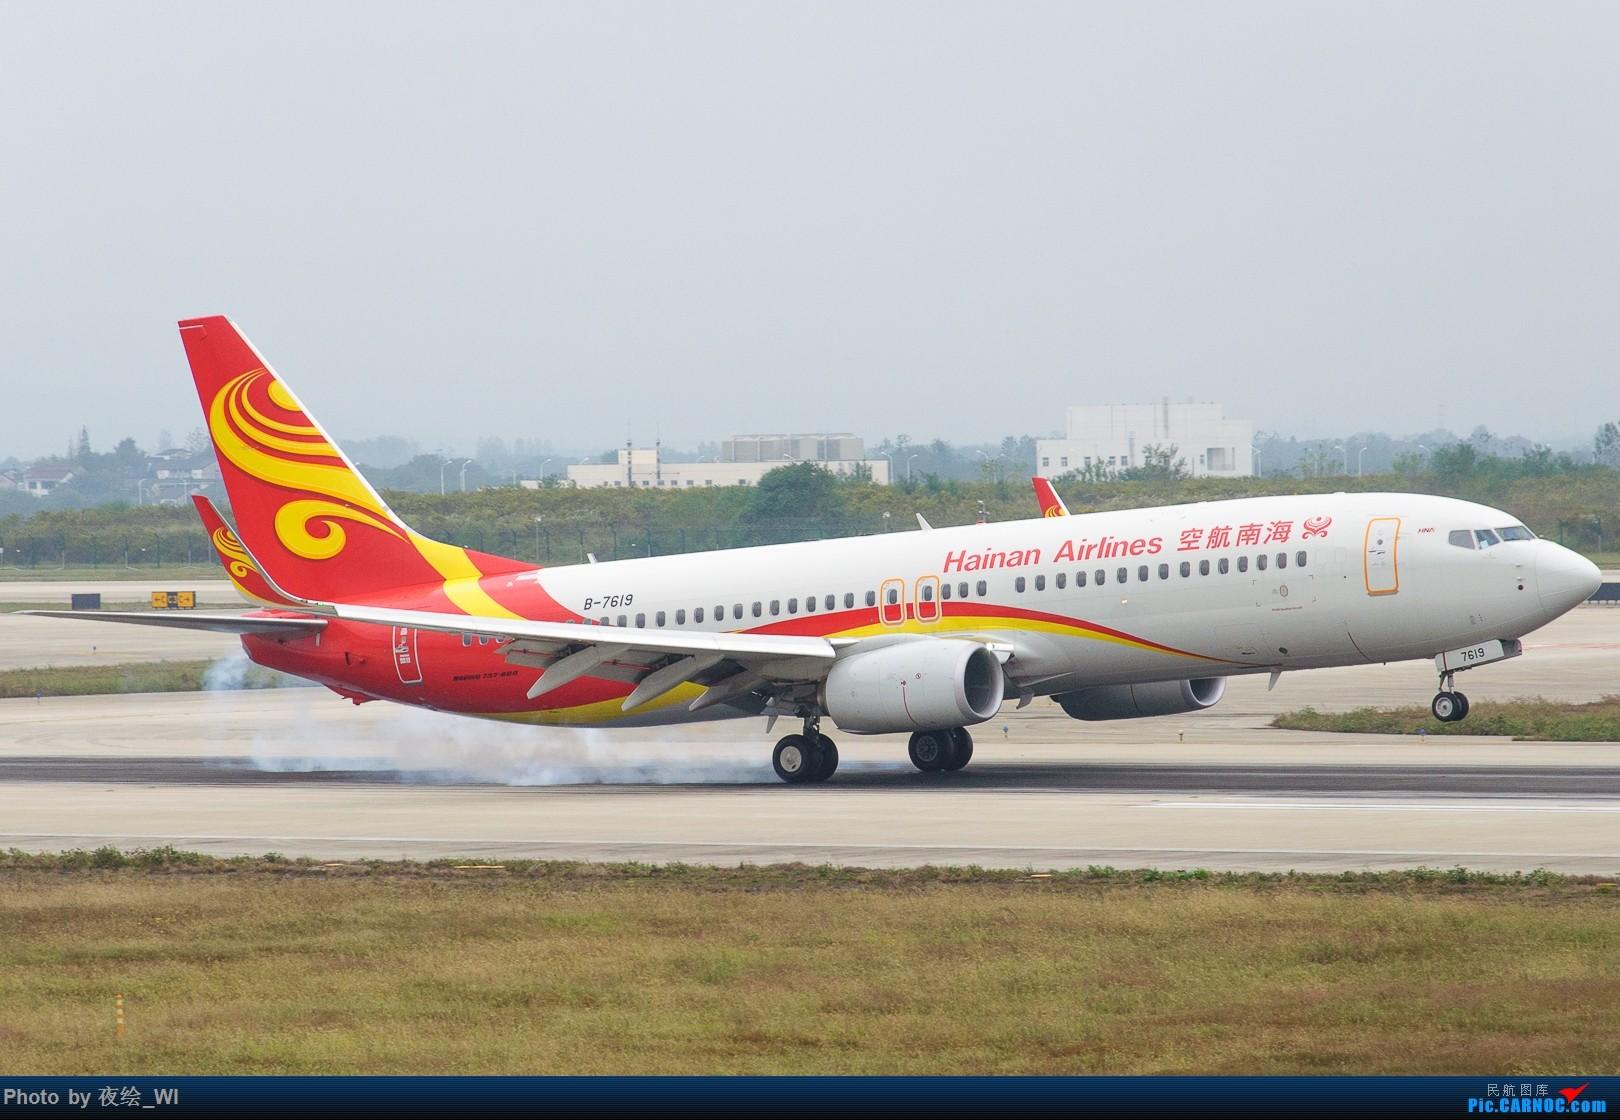 Re:[原创]【NKG】生日也要拍飞机,珍惜南京久违的单跑运行时光 BOEING 737-800 B-7619 中国南京禄口国际机场